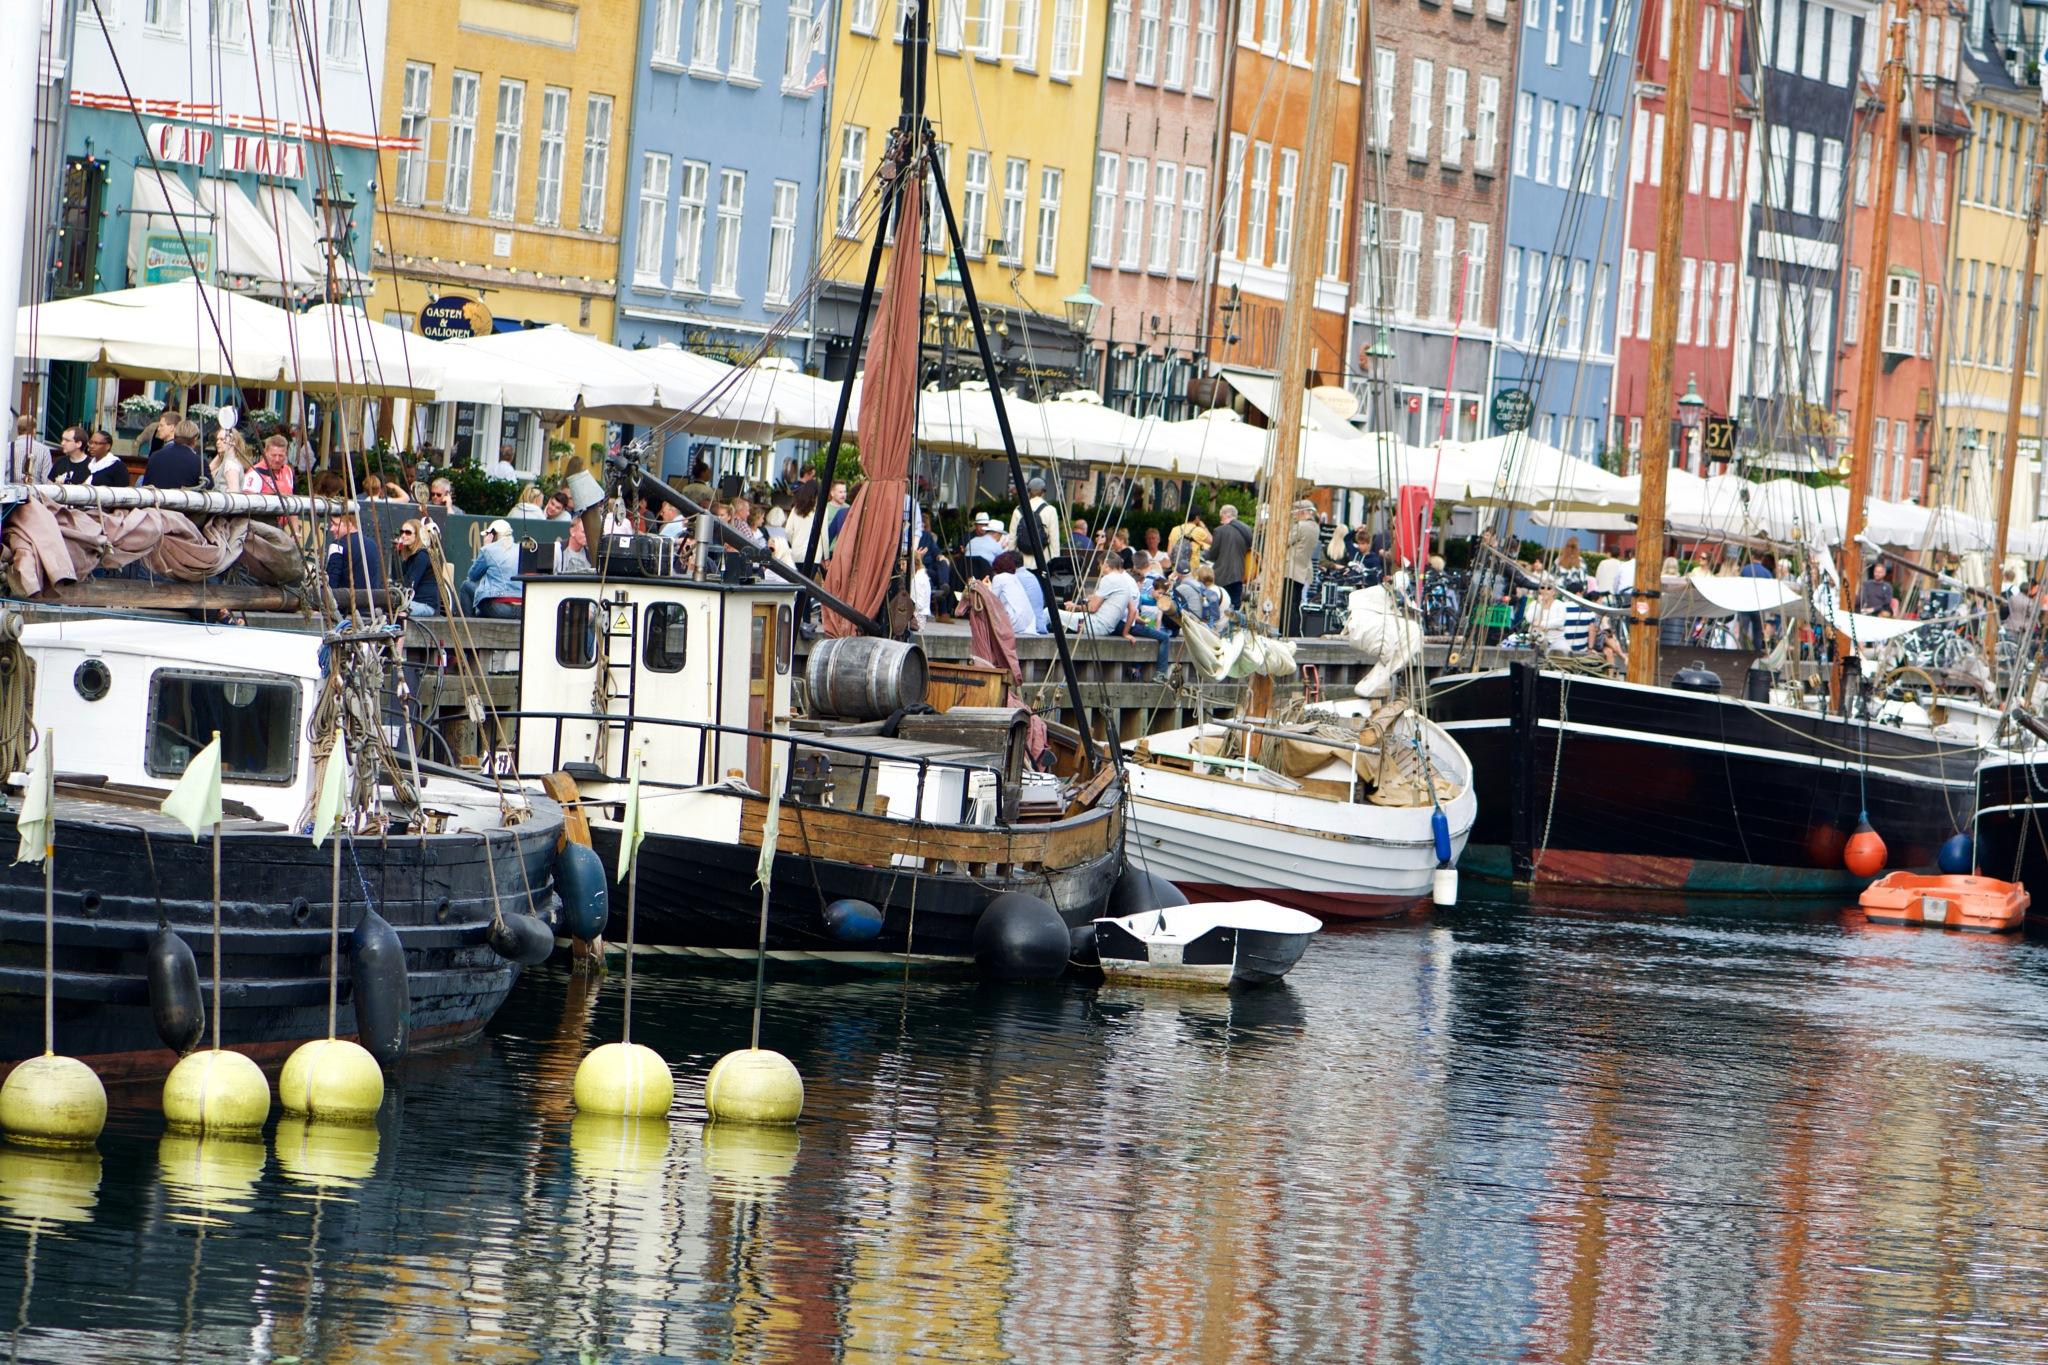 Nyhaven Copenhagen 2! by Memed Bayatli